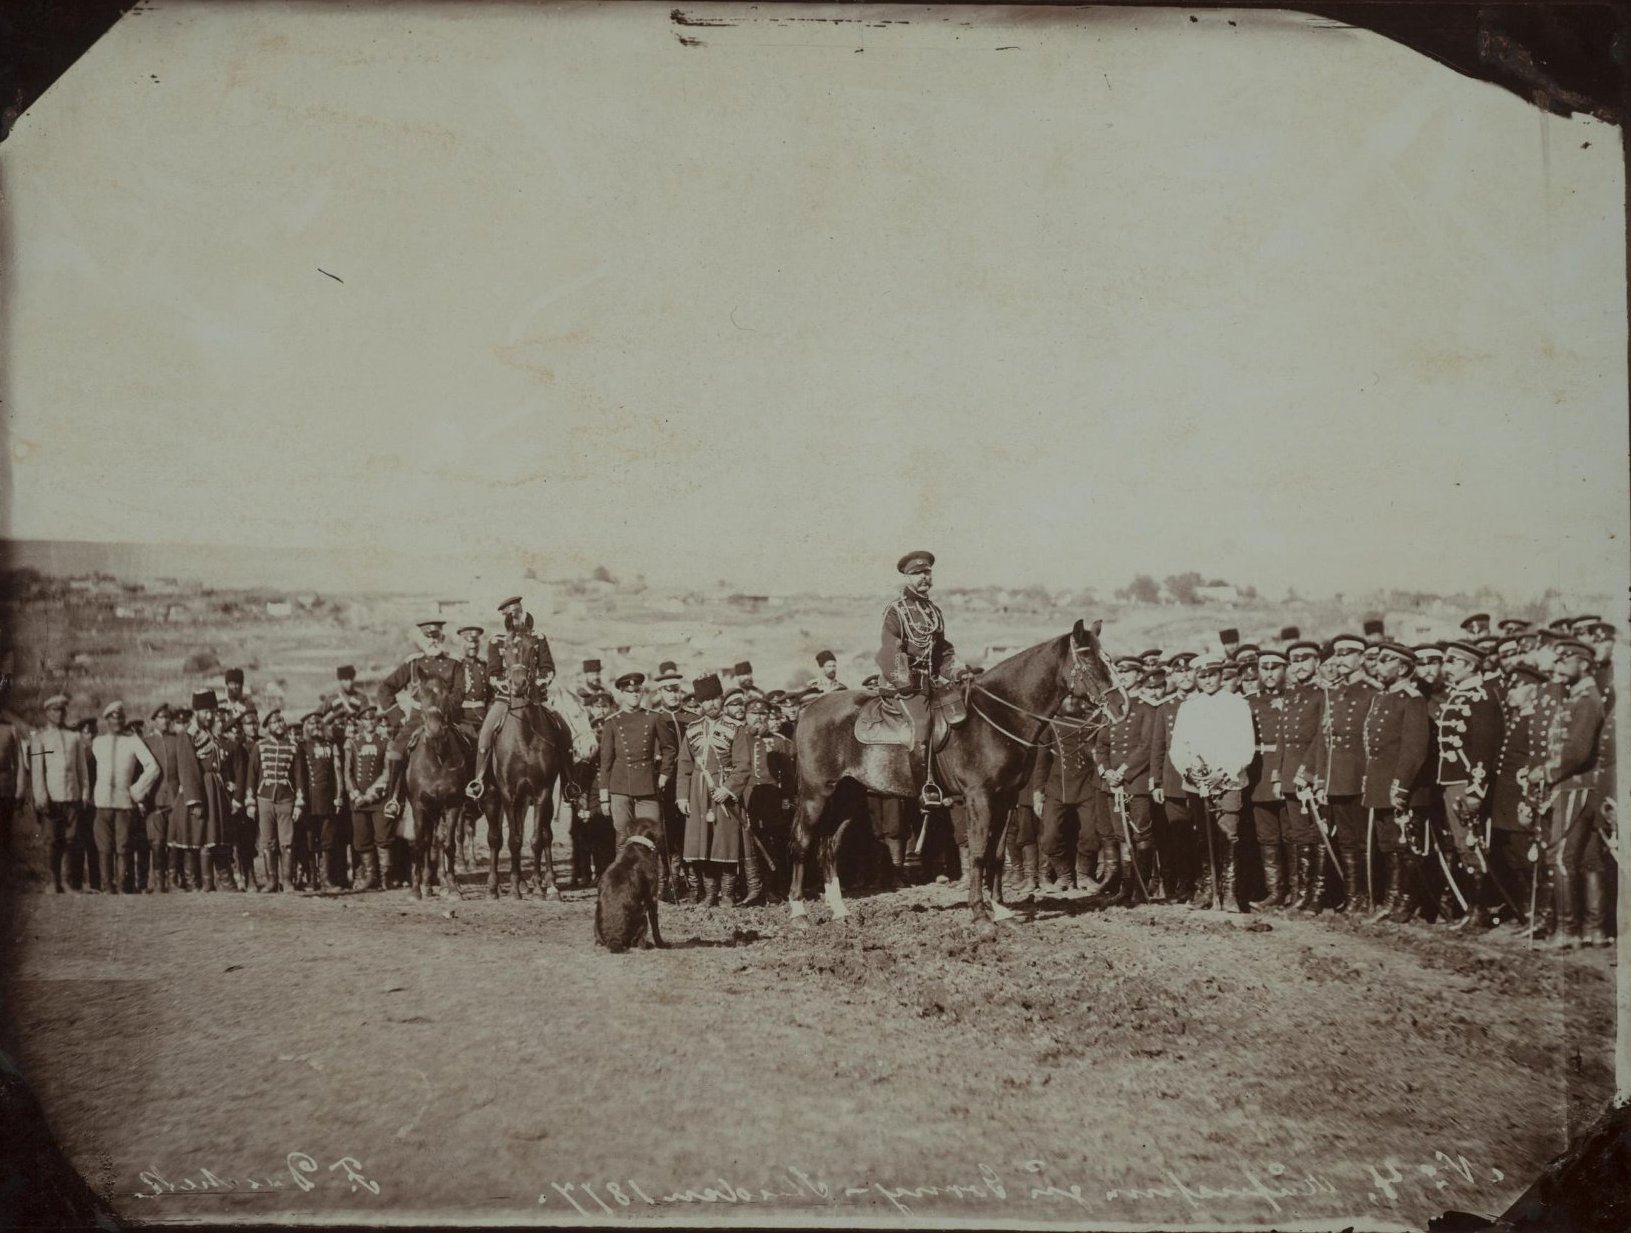 Александр II на коне со свитой в Горном Студне. Duschek Franz. 1877-1878 гг.